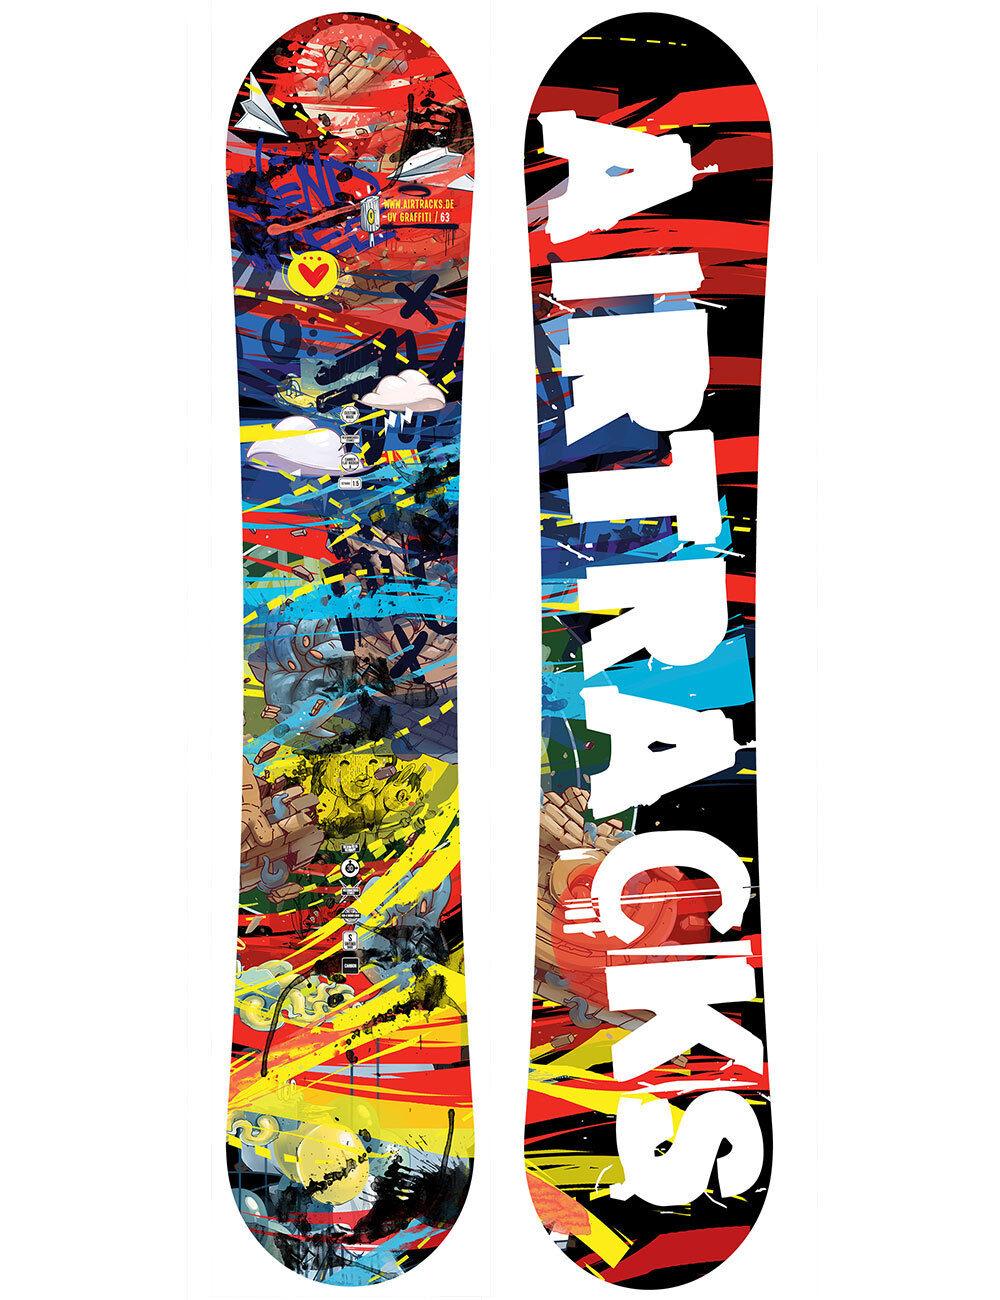 AIRTRACKS Snowboard Graffiti Zero Flat Freestyle Allmountain Wide 155 159 163 cm